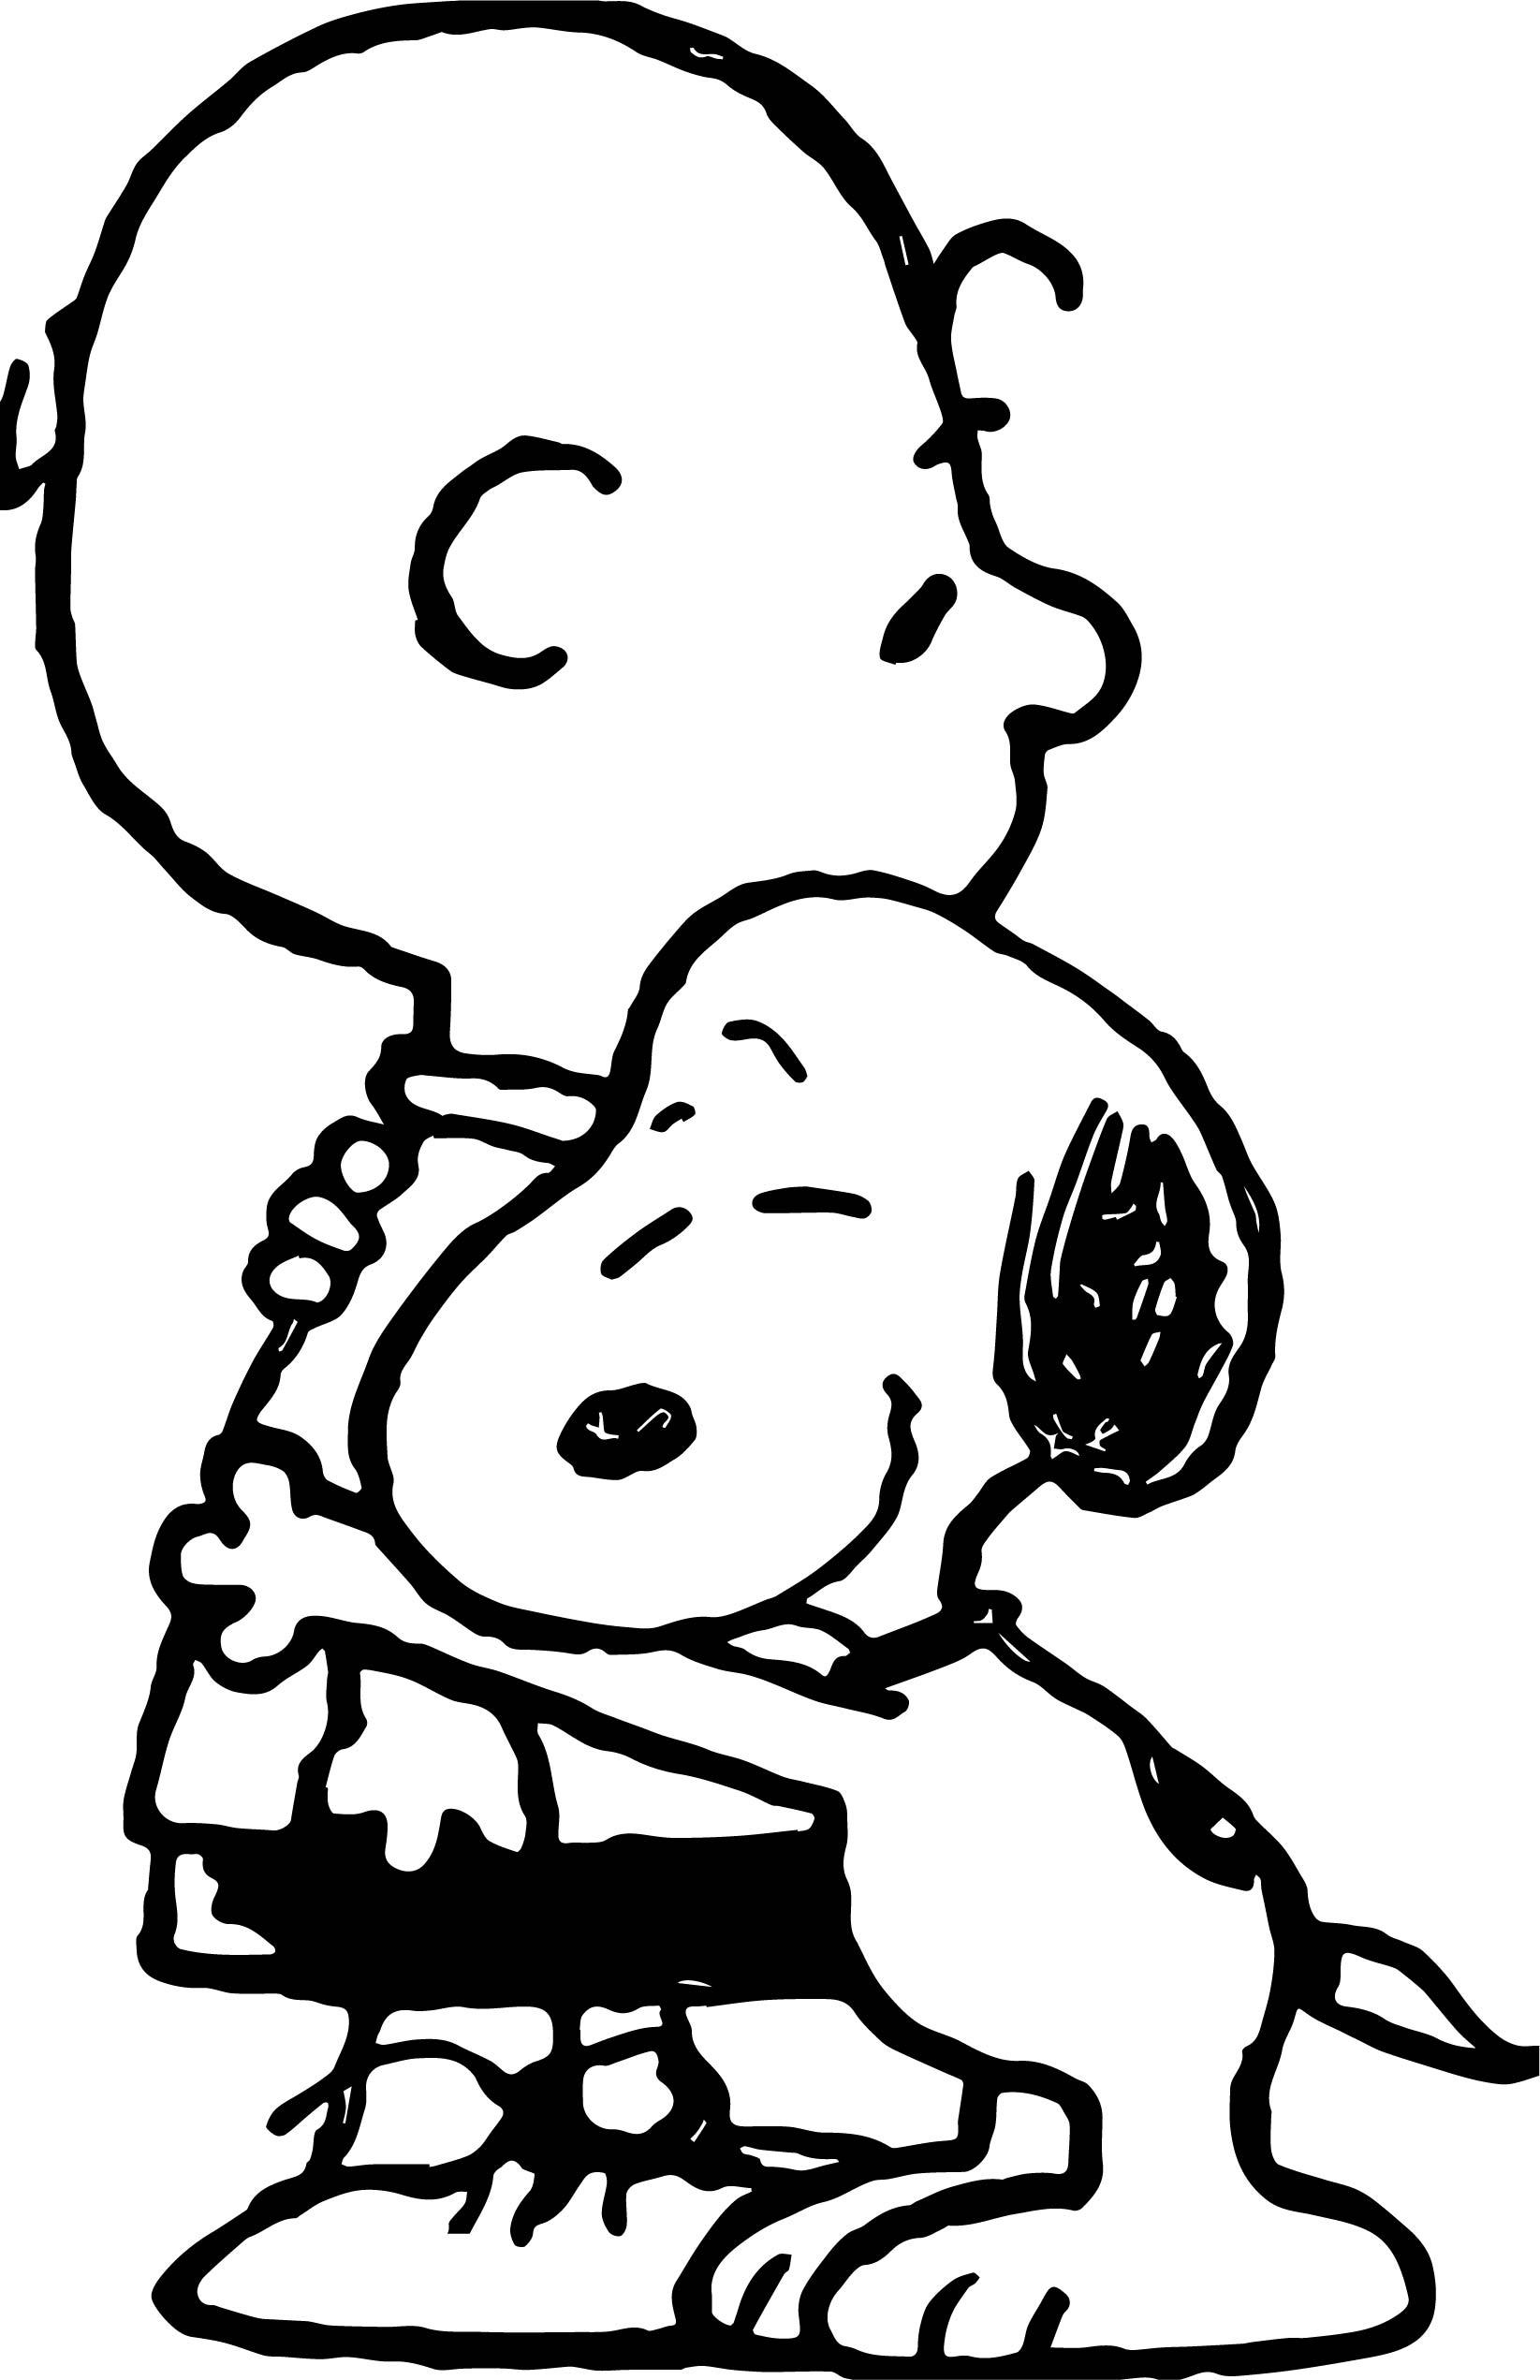 Snoopy Hug Coloring Page